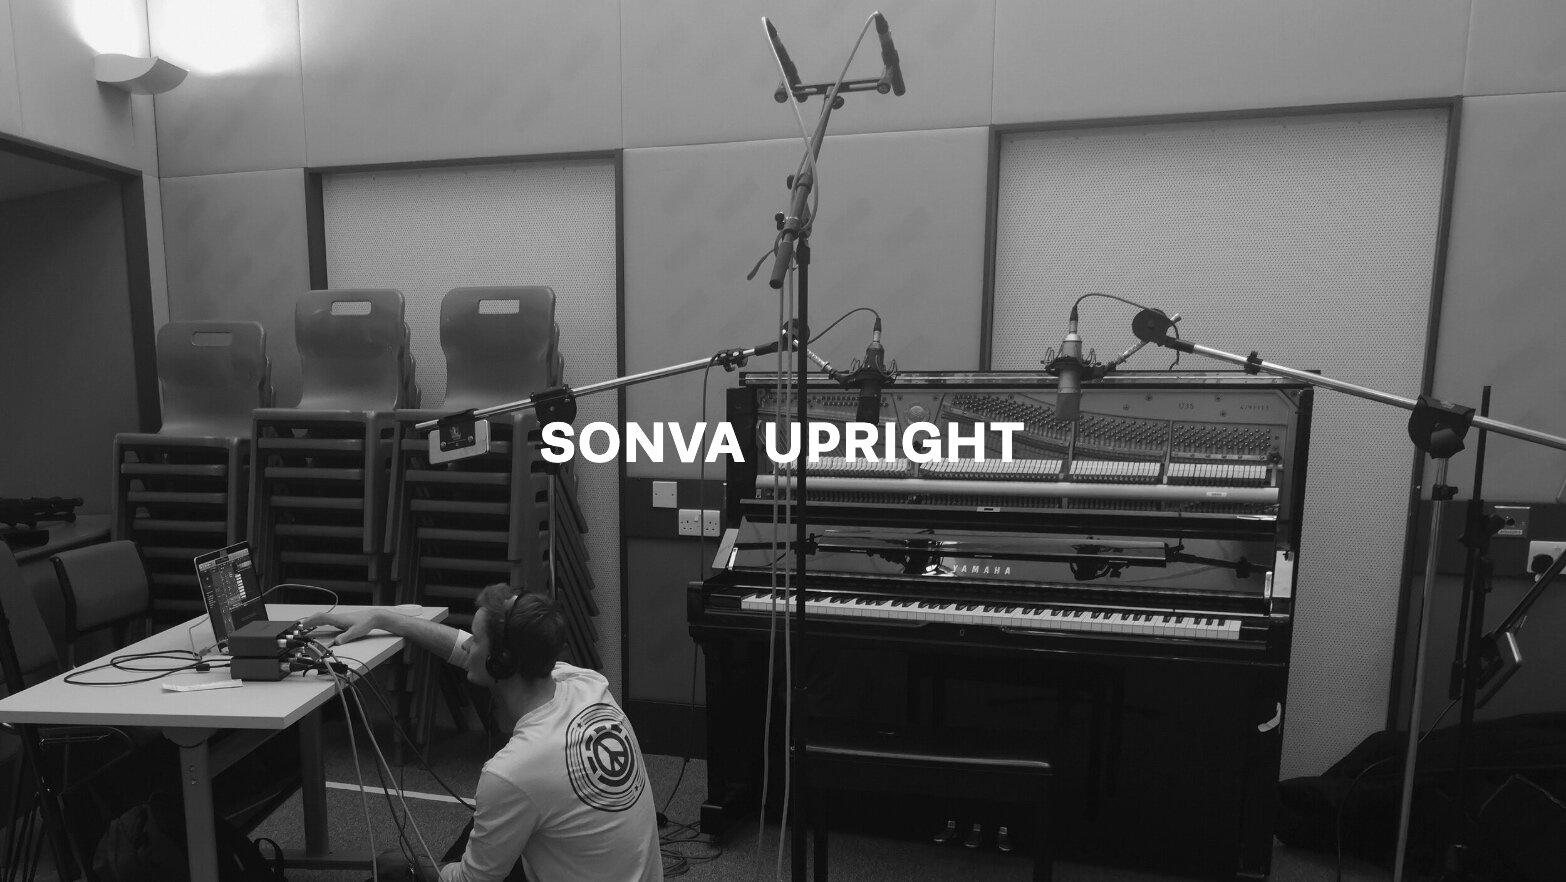 Sonva Upright Text.jpg